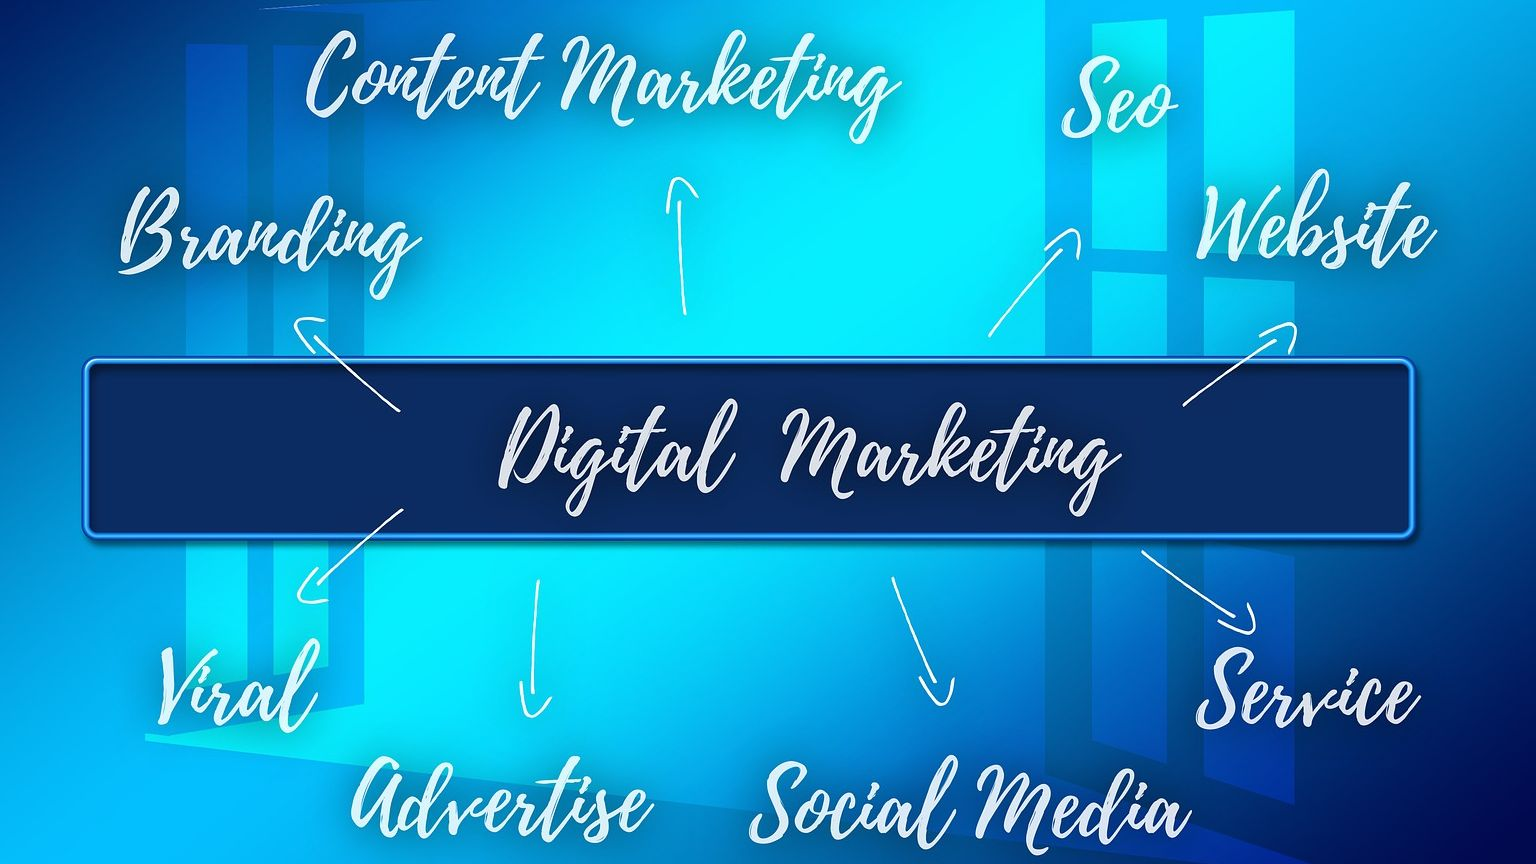 PwC Markenstudie: Soziale Medien beeinflussen Markenwert positiv